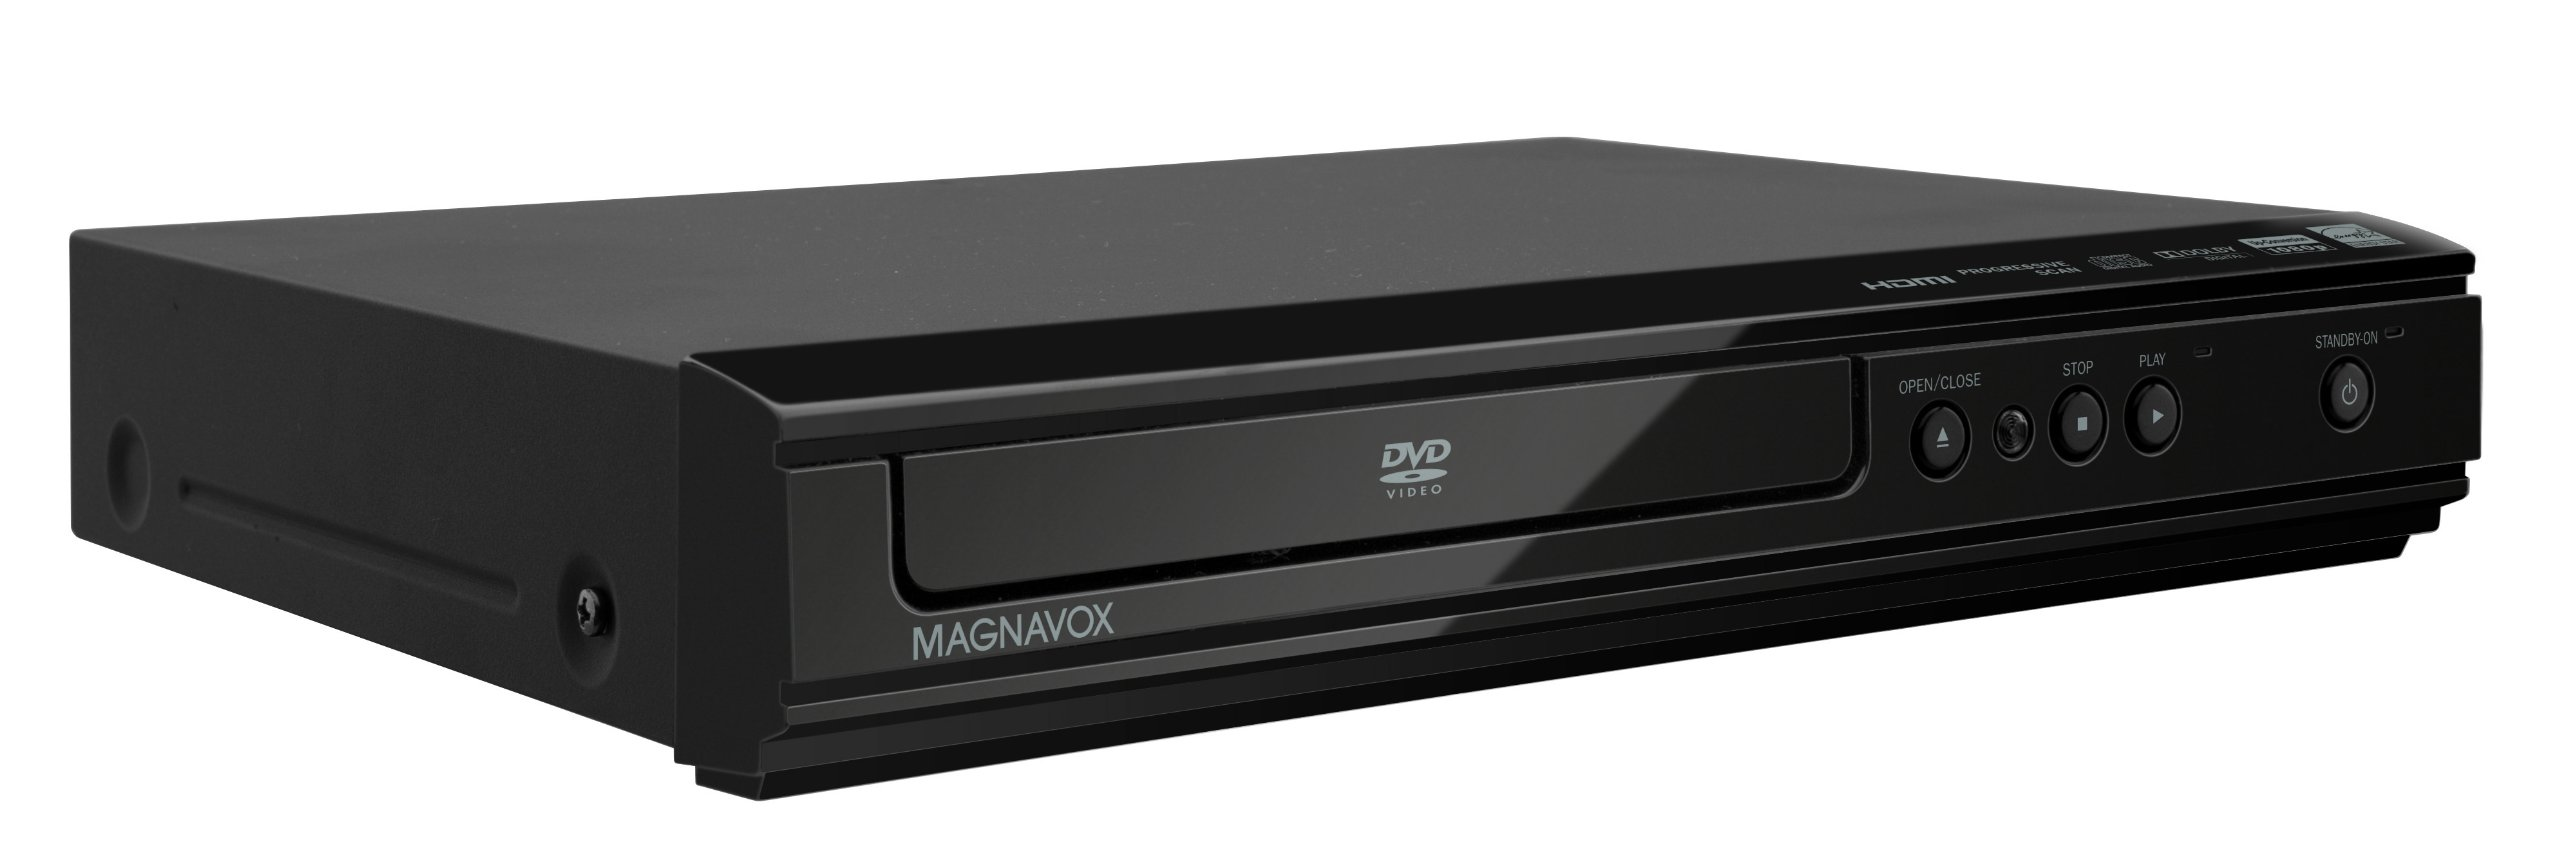 Magnavox MDV3000/F7 Up Conversion DVD player, Black by Magnavox